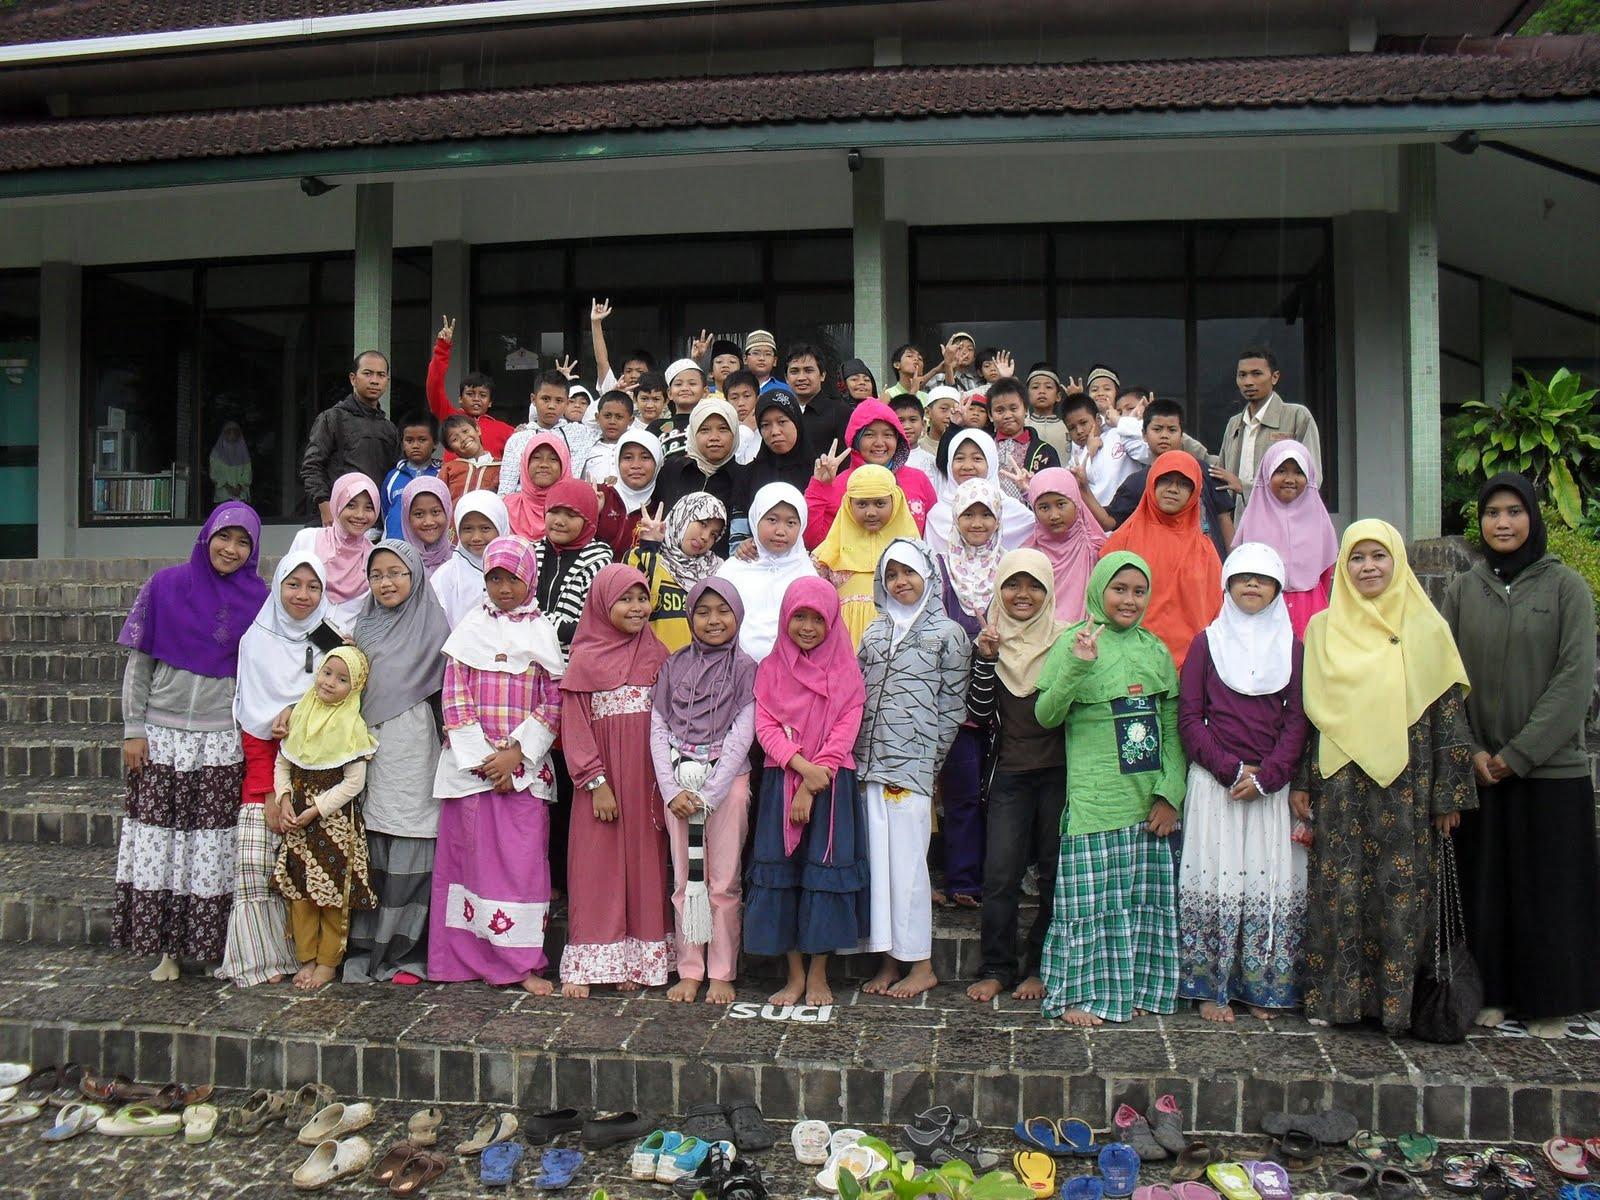 http://4.bp.blogspot.com/-bwimUsIy_5E/Tfr-4OXEVjI/AAAAAAAAAFw/6AHW3DRALho/s1600/AMST+di+depan+Masjid+Hidayatullah.jpg